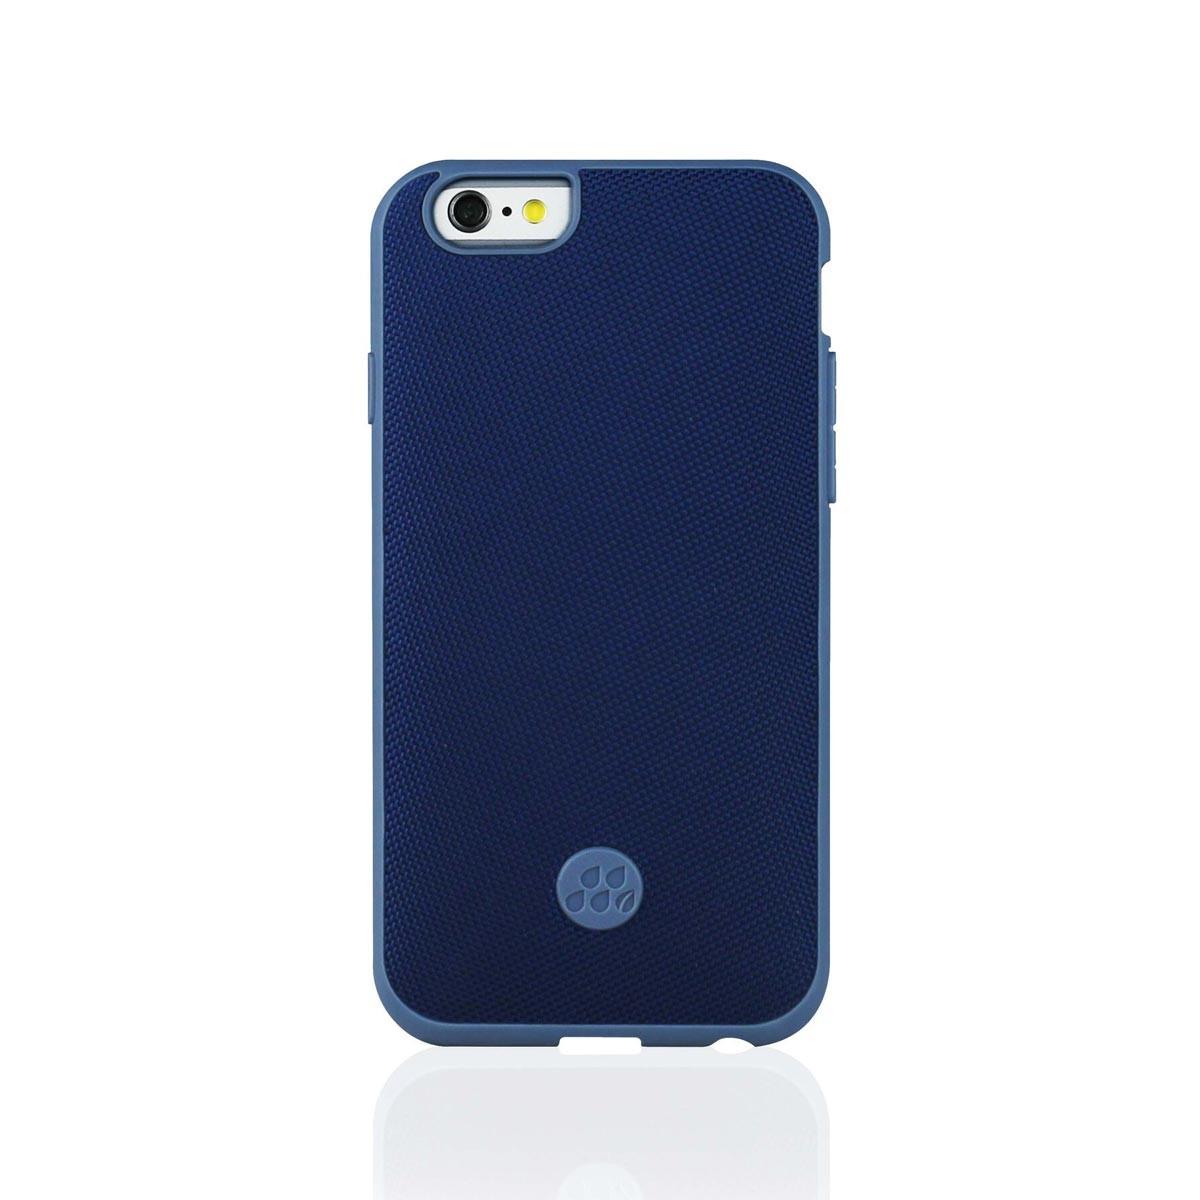 Evutec - Ballistic Nylon ST for iPhone 6/6s - Blue